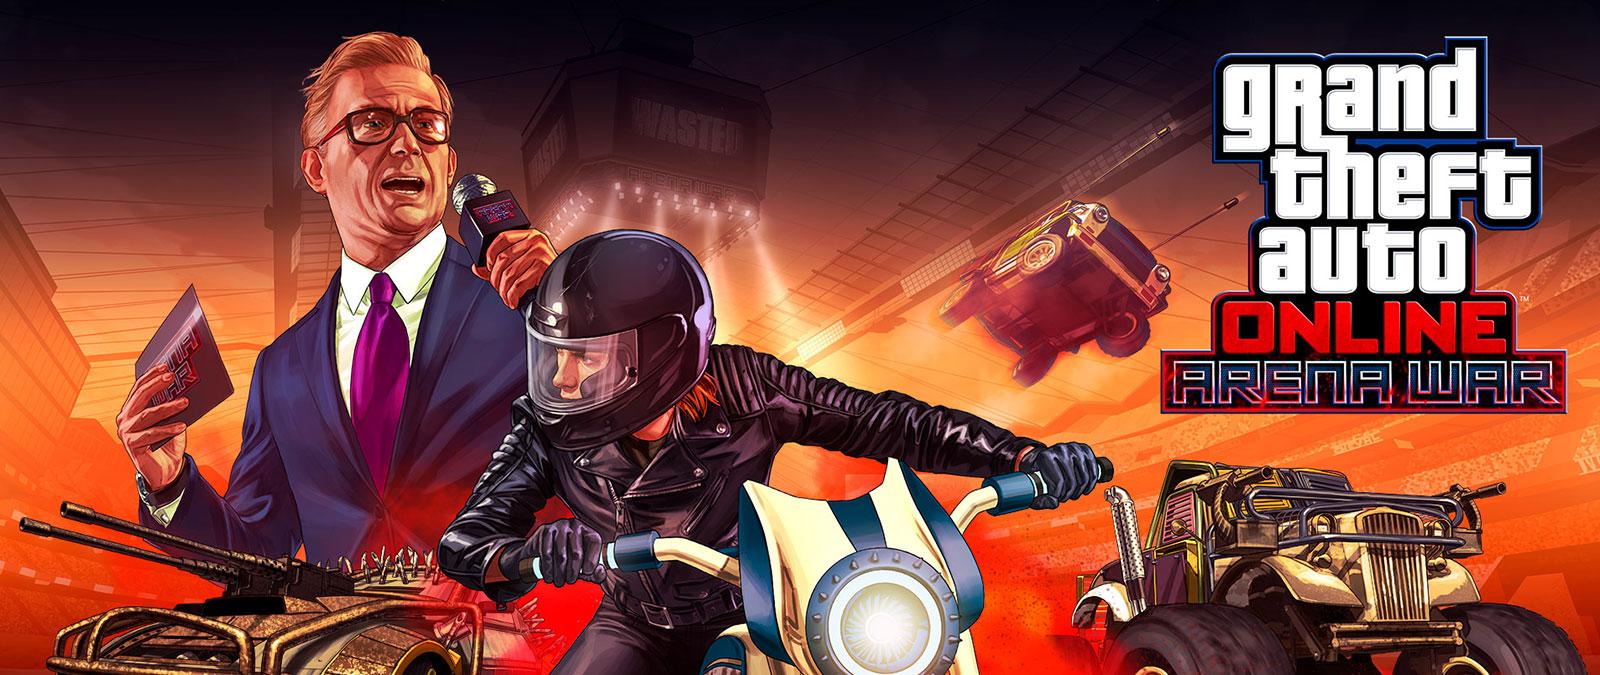 Grand Theft Auto Online Arena Wars,多台車輛且車輛上放置武器,背景有位廣播員。